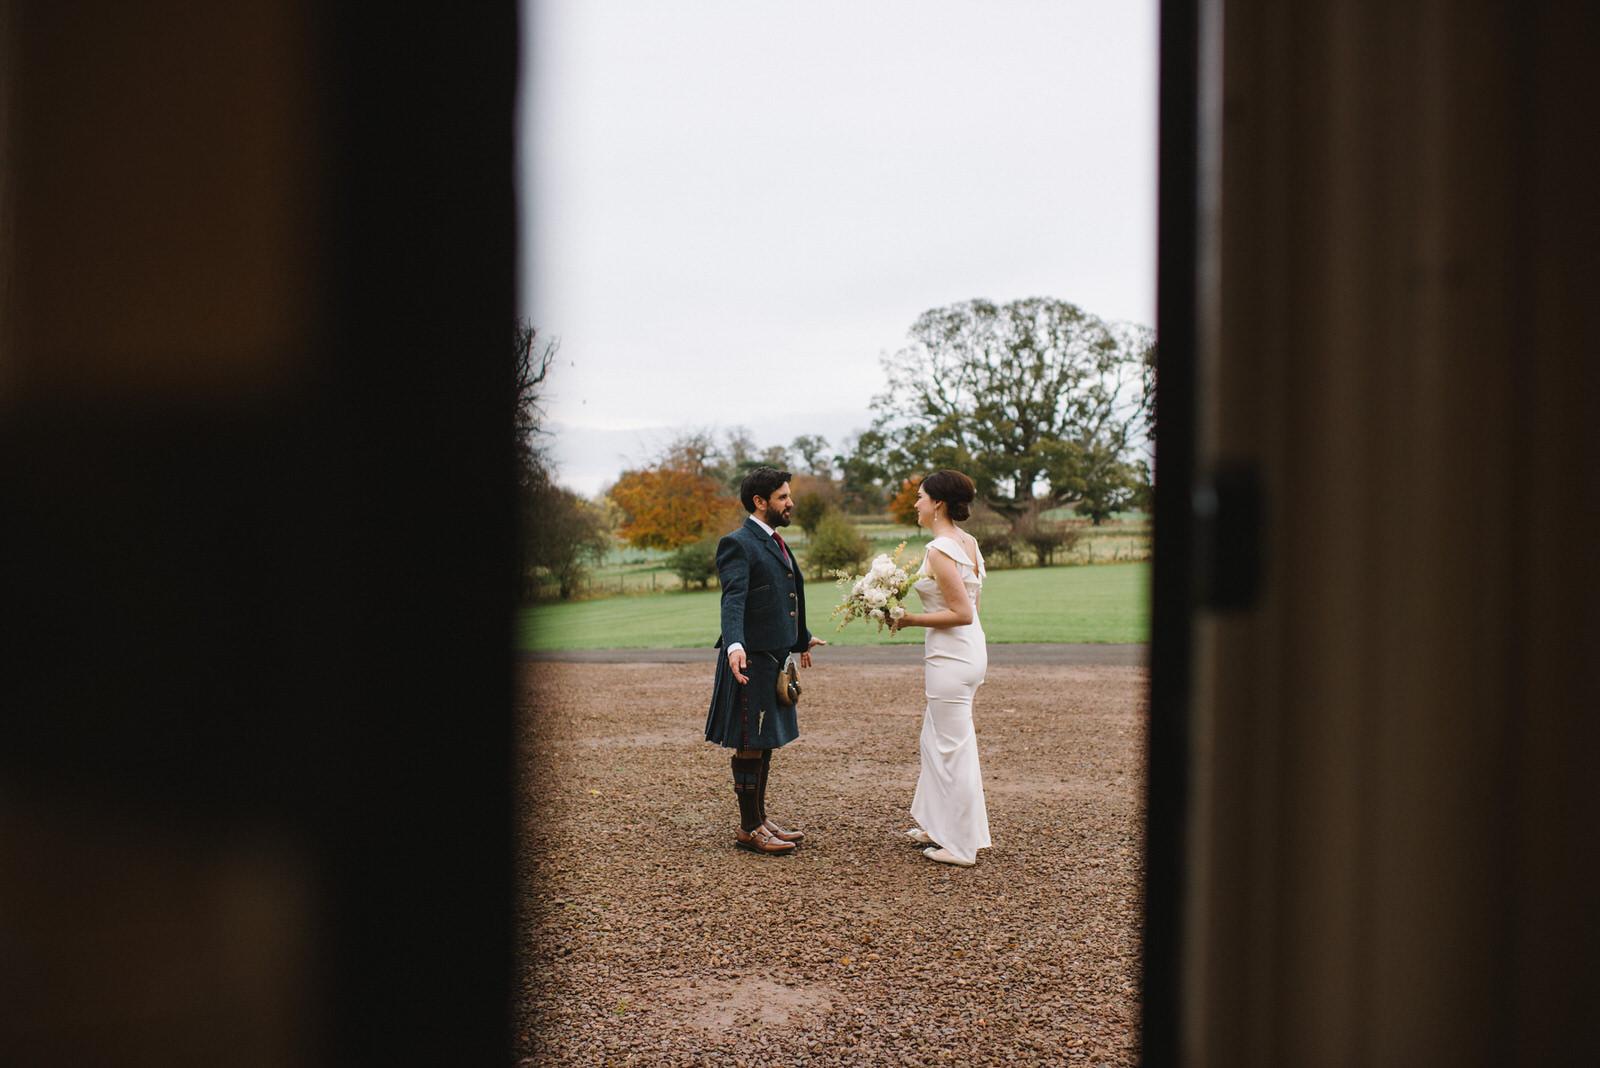 018-COLSTOUN-HOUSE-WEDDING-ALTERNATIVE-WEDDING-PHOTOGRAPHER-GLASGOW-WEDDING-PHOTOGRAPHER-STYLISH-SCOTTISH-WEDDING.JPG